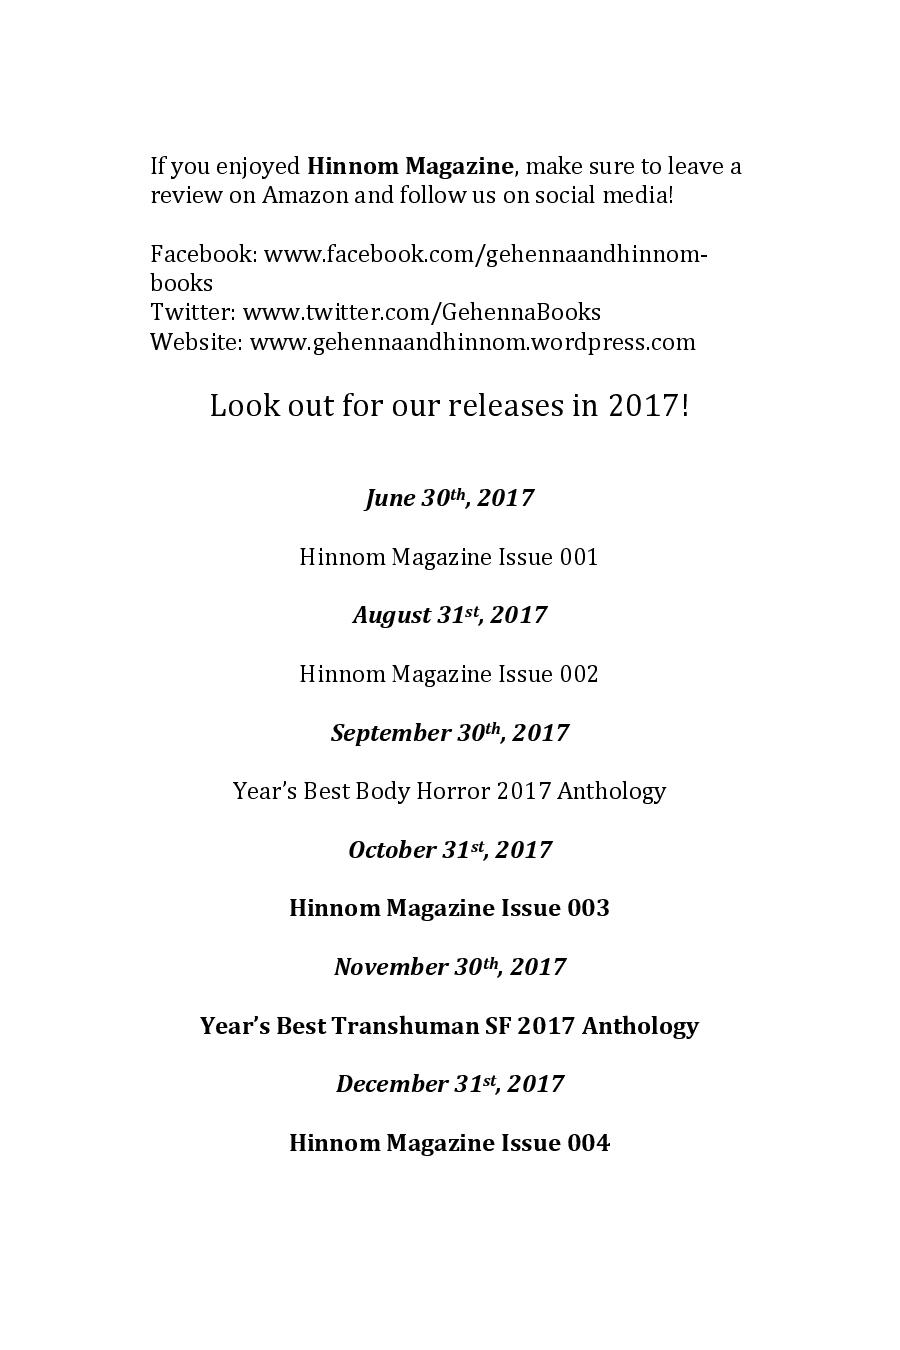 Hinnom Magazine 003 Manuscript Print-page-141